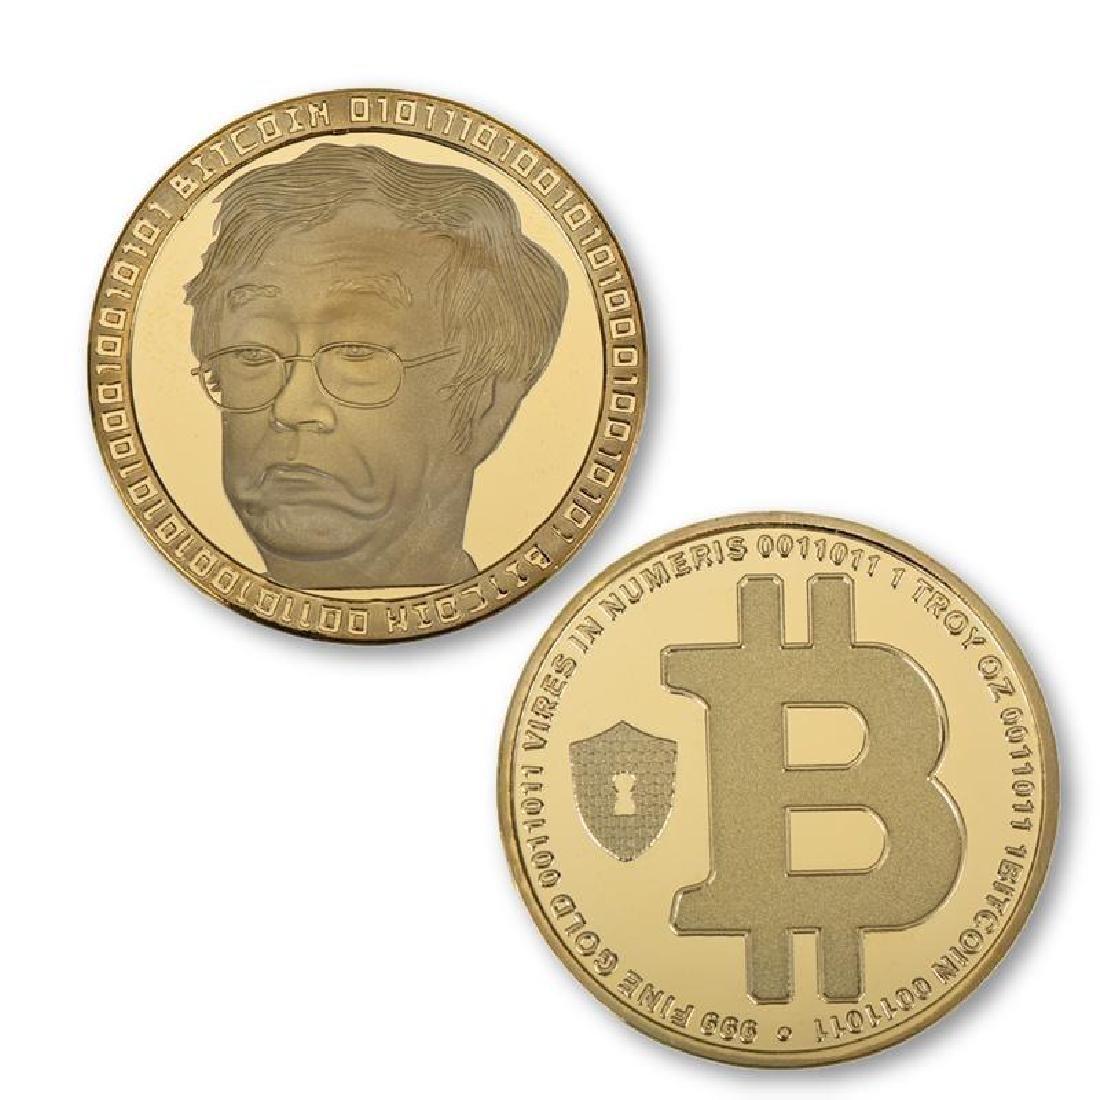 4 Bitcoin Silver and Gold Clad Collectible Coins - 3